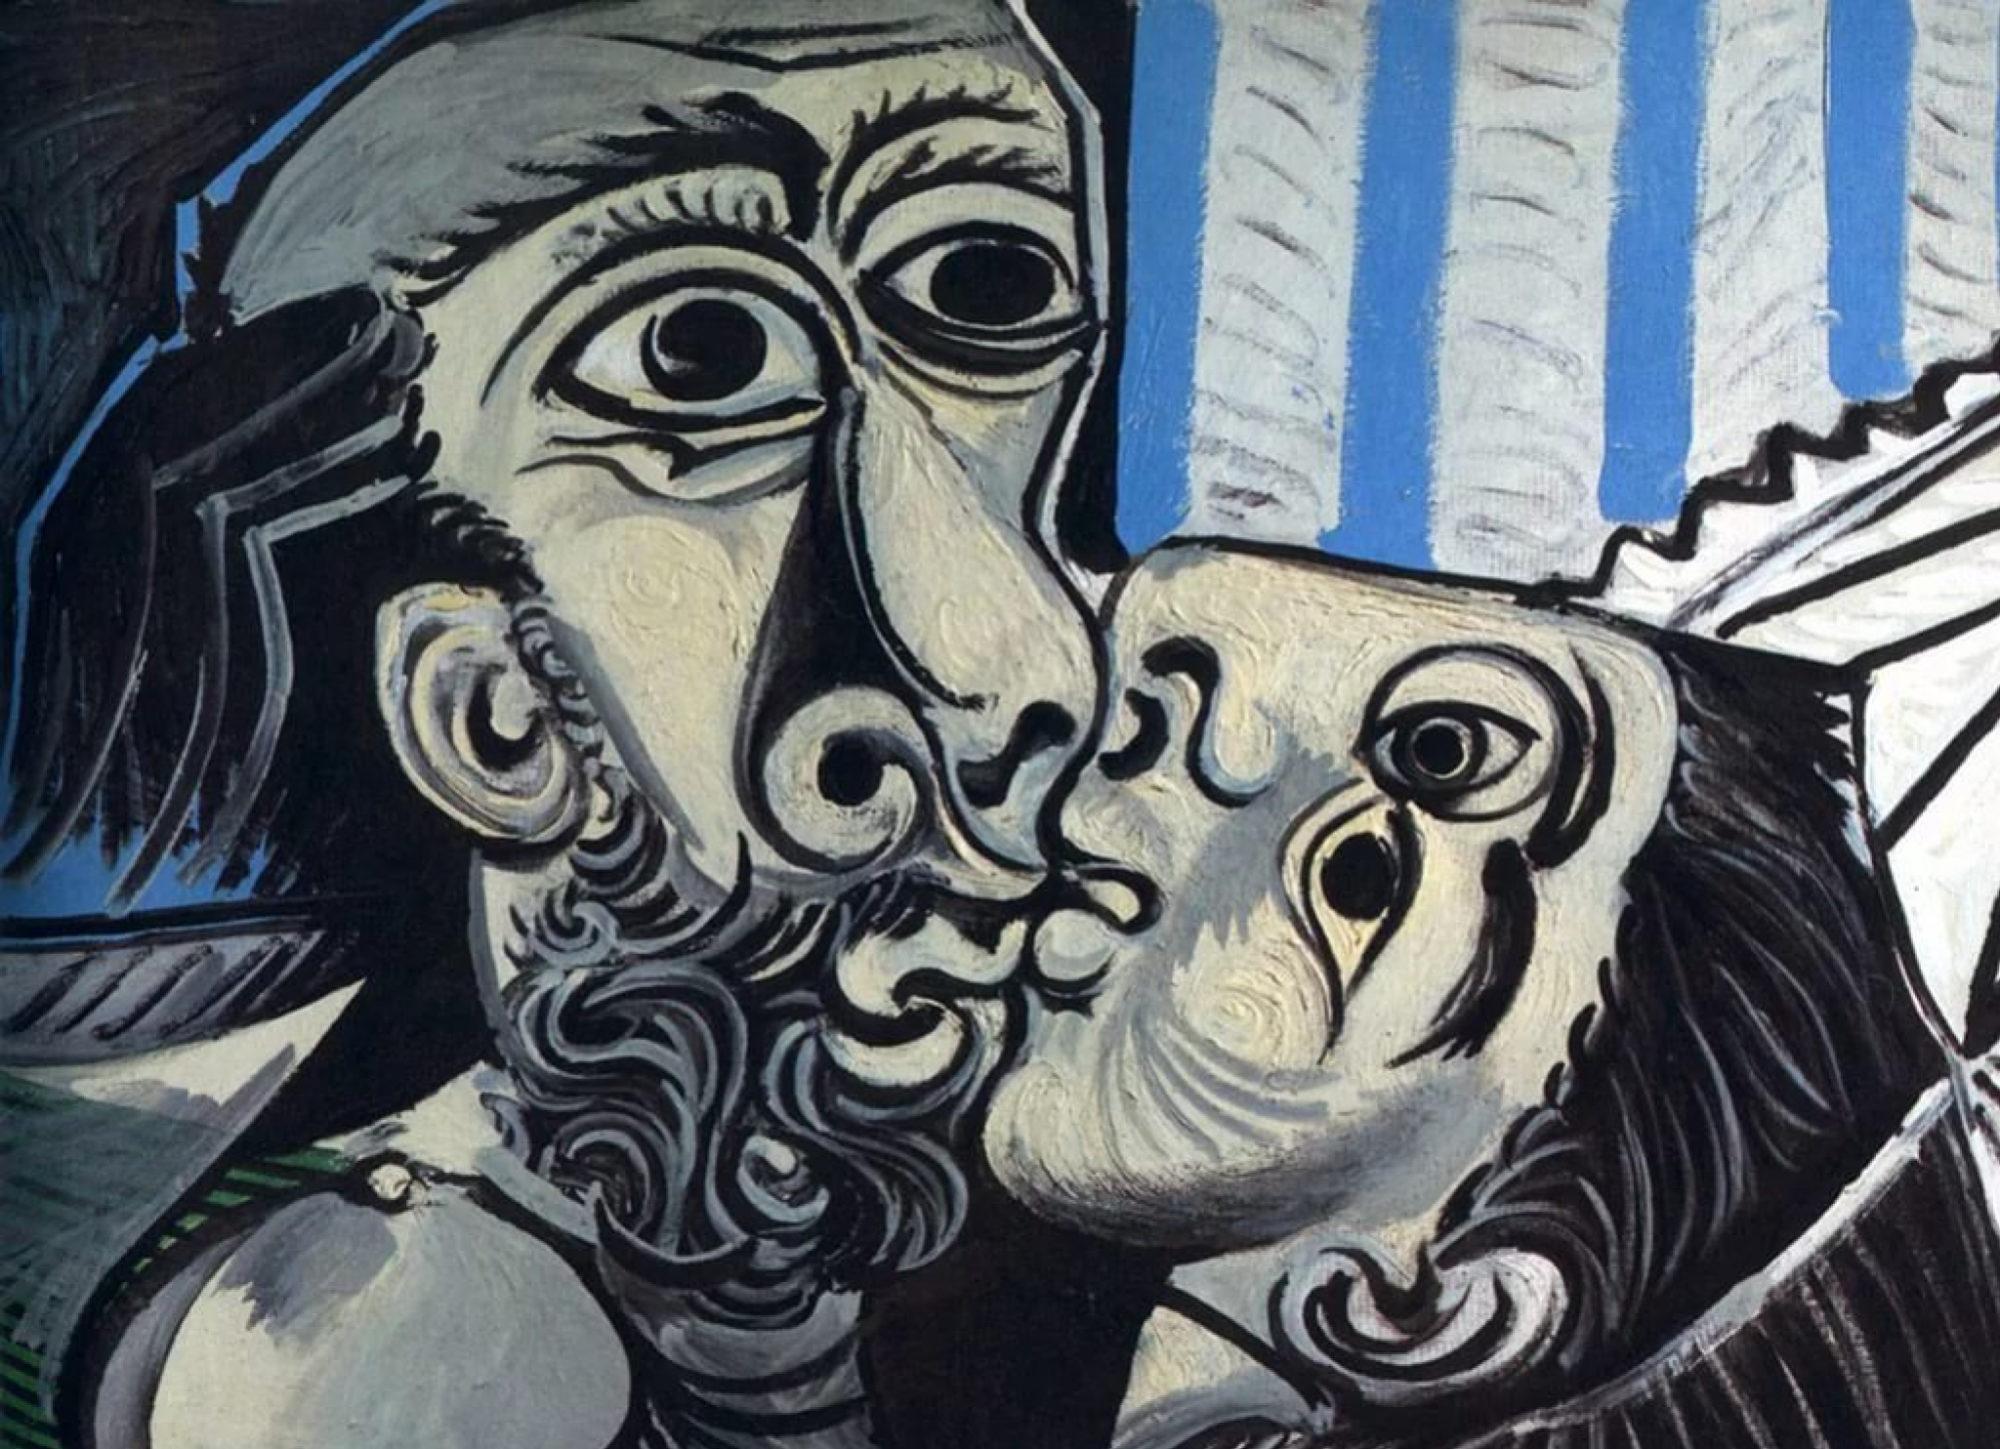 Пабло Пикассо, 1969 год, картина «Поцелуй».